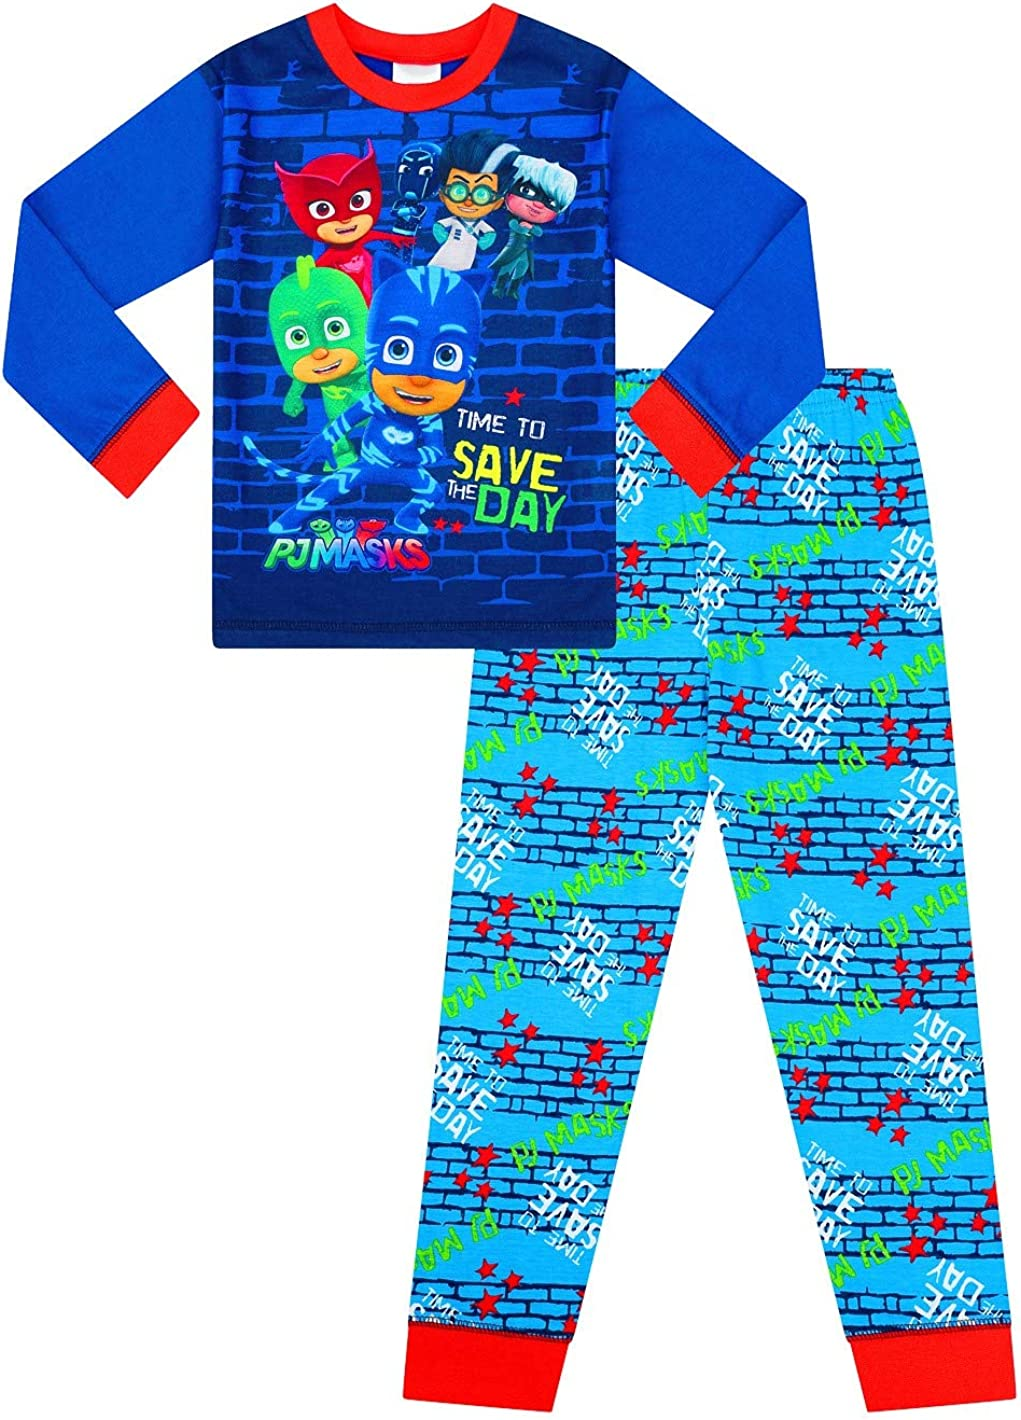 Pijama largo para niños con máscara de pijama azul